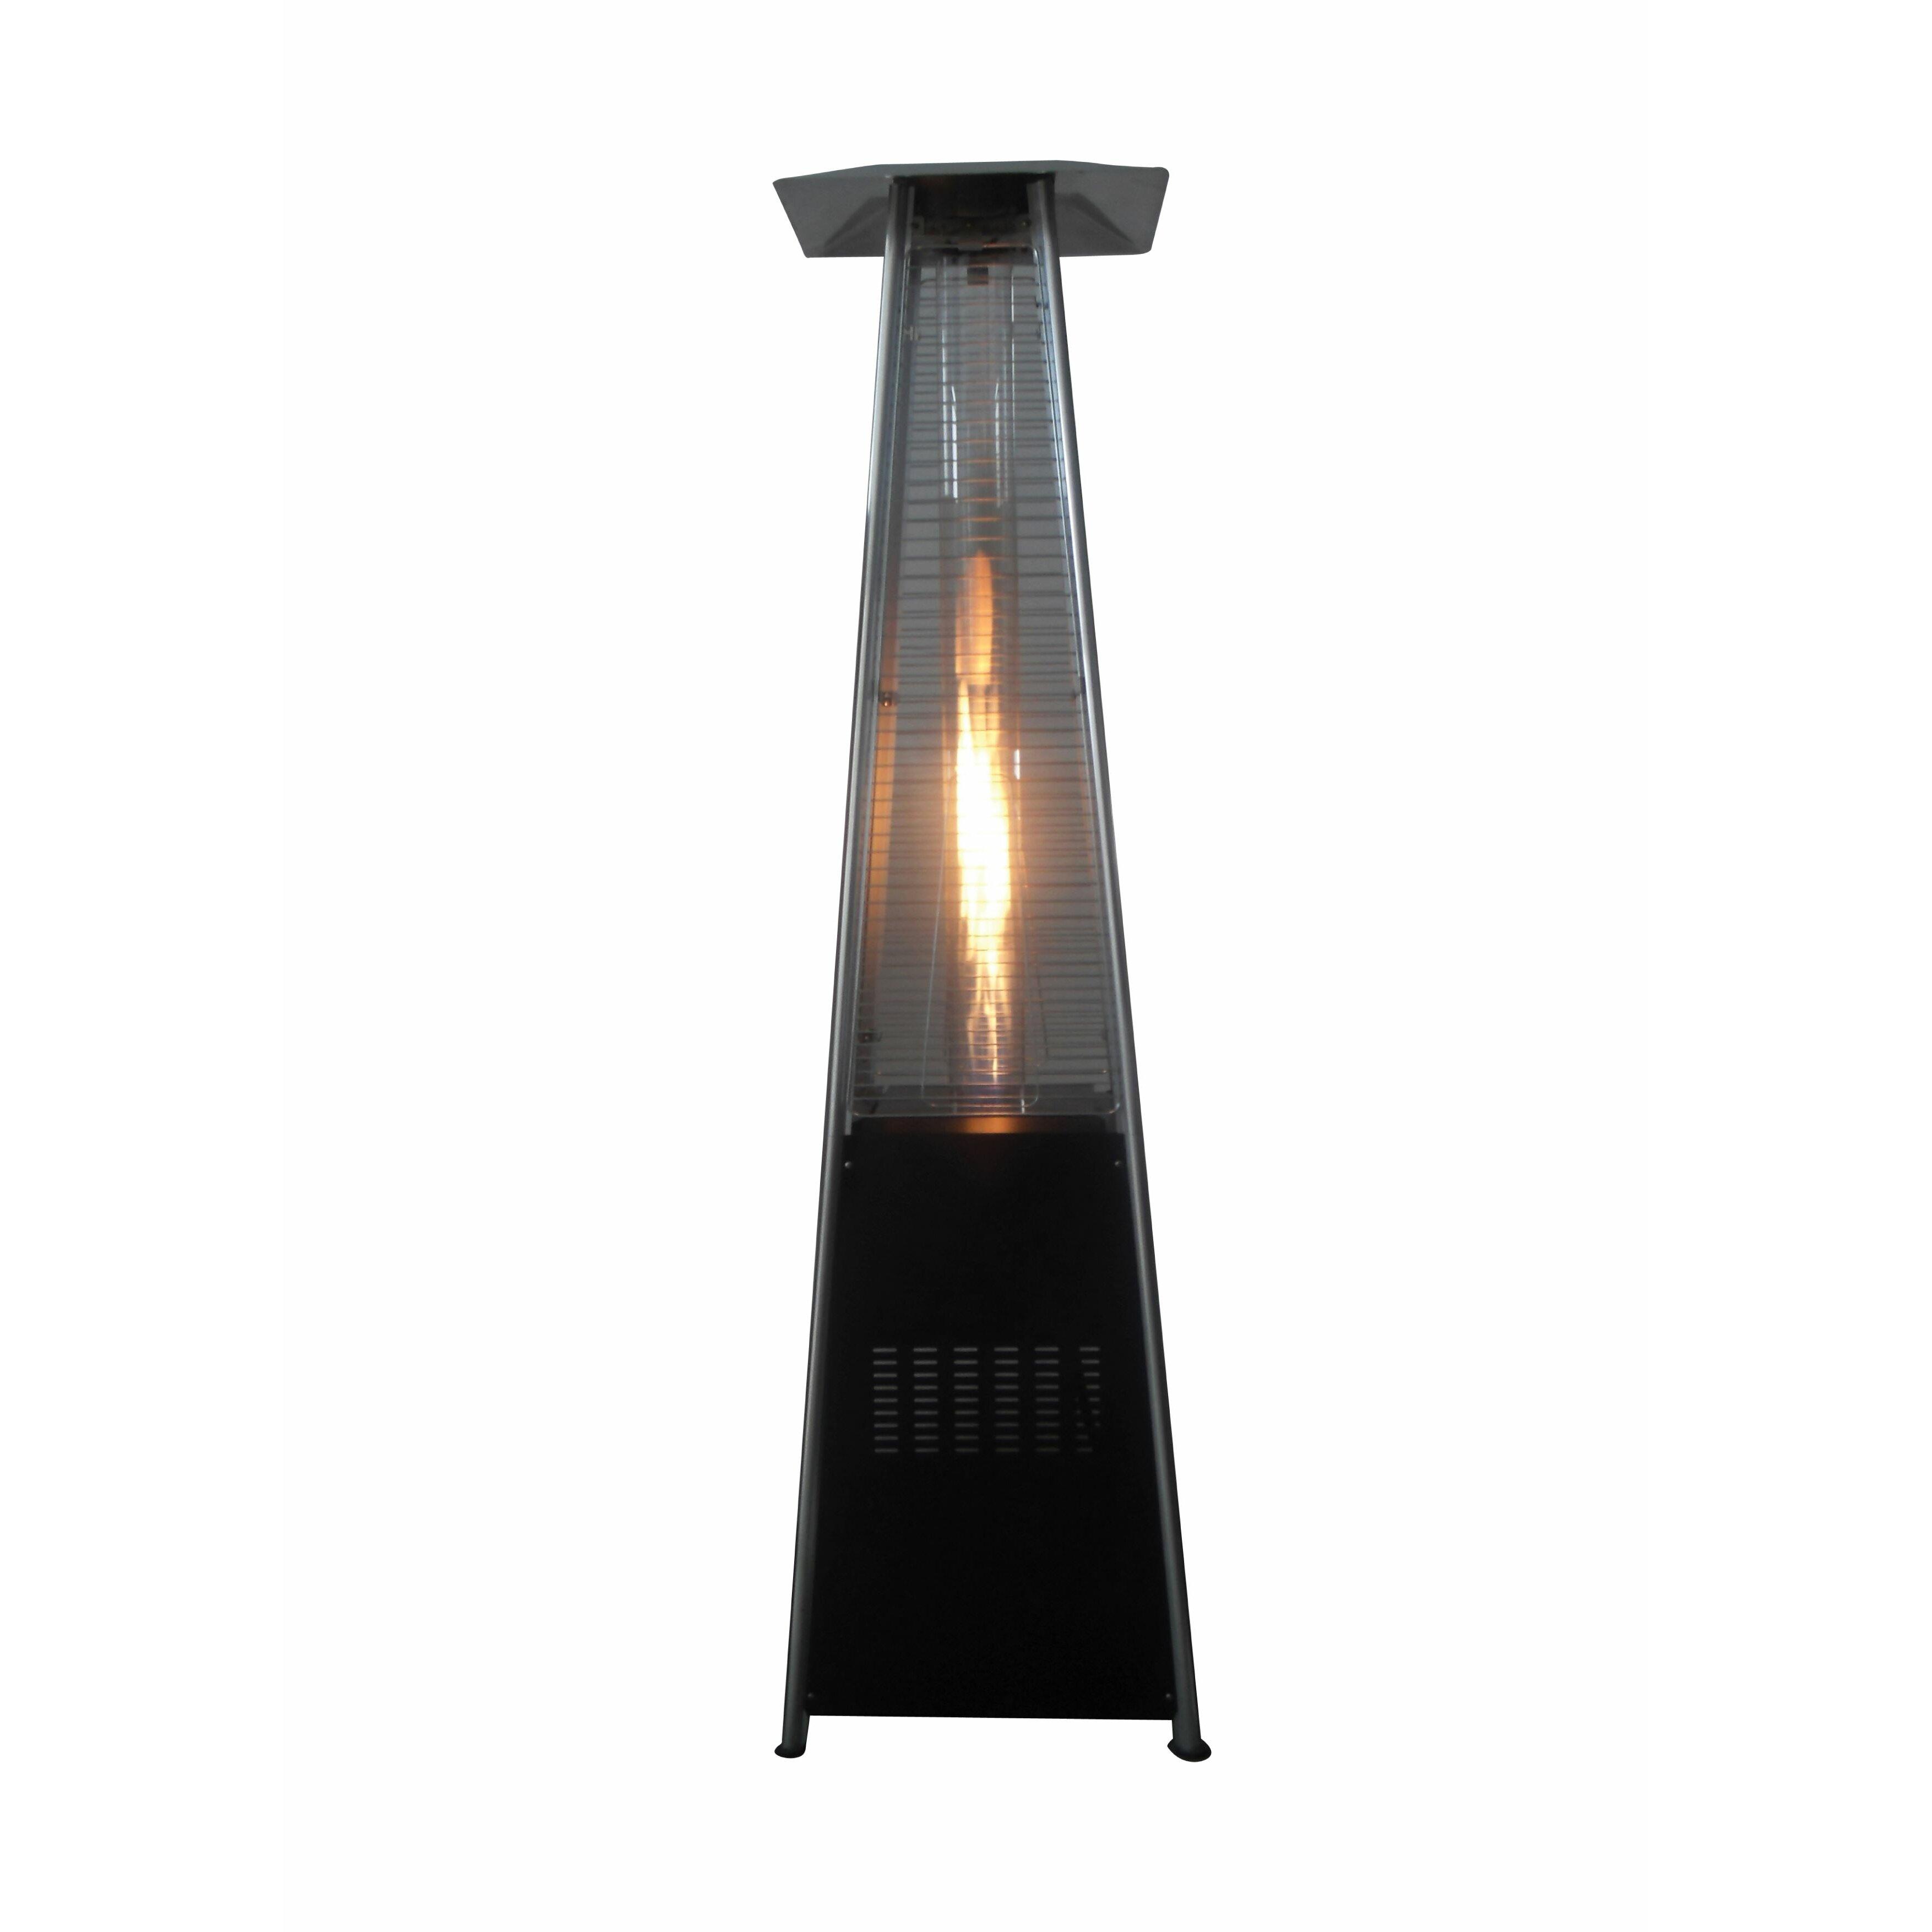 Gardensun Pyramid Shape Dancing Flame Outdoor Glass Tube Propane Patio Heater